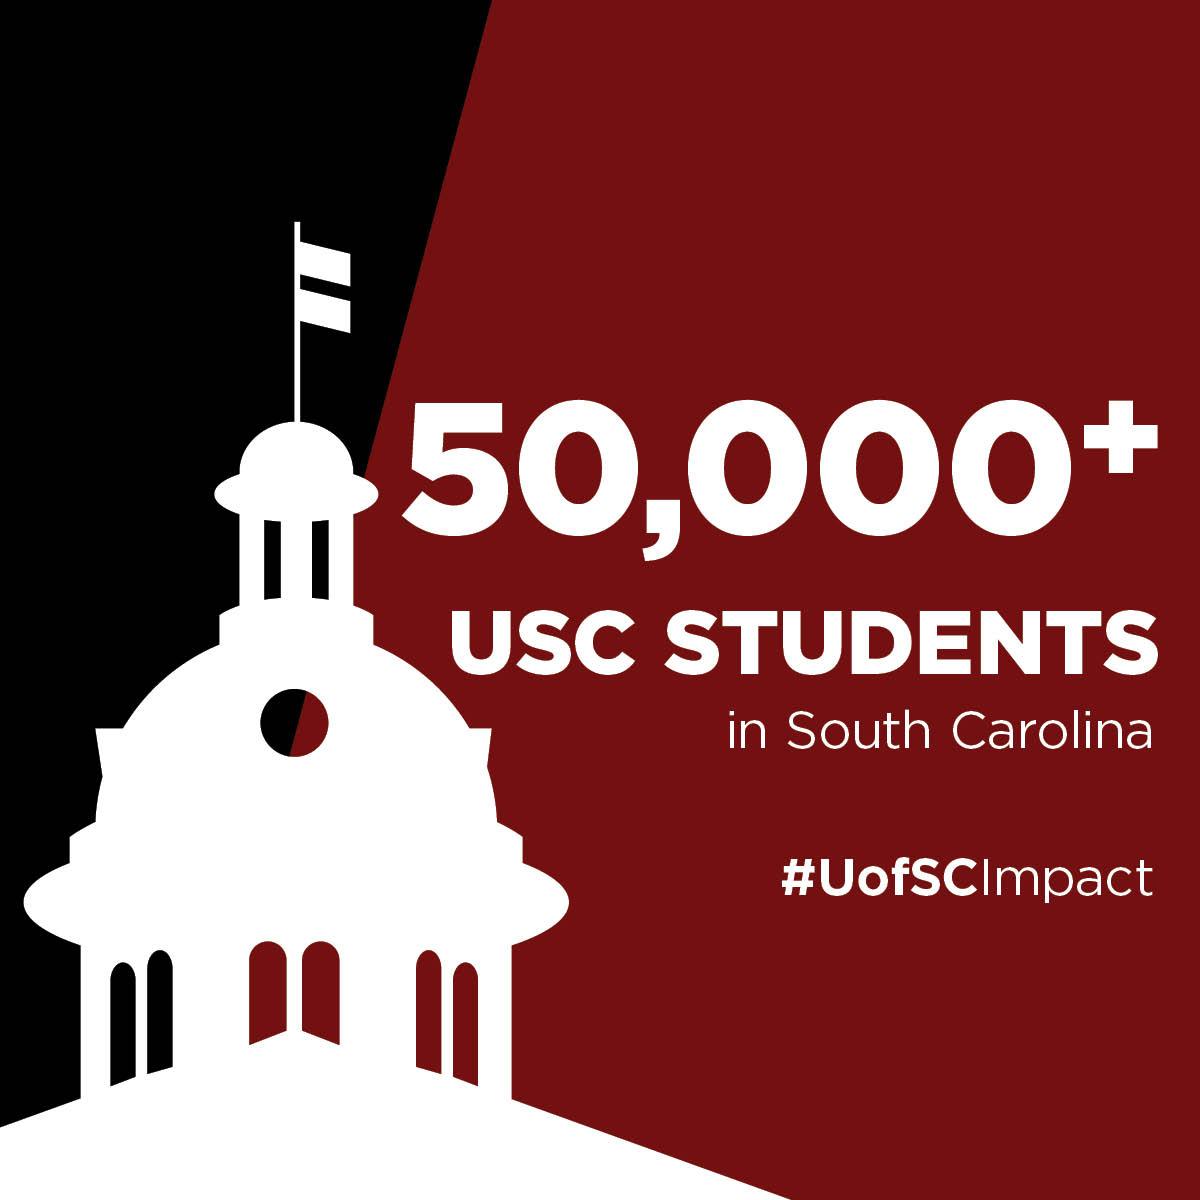 50,000 USC students in South Carolina #UofSCImpact